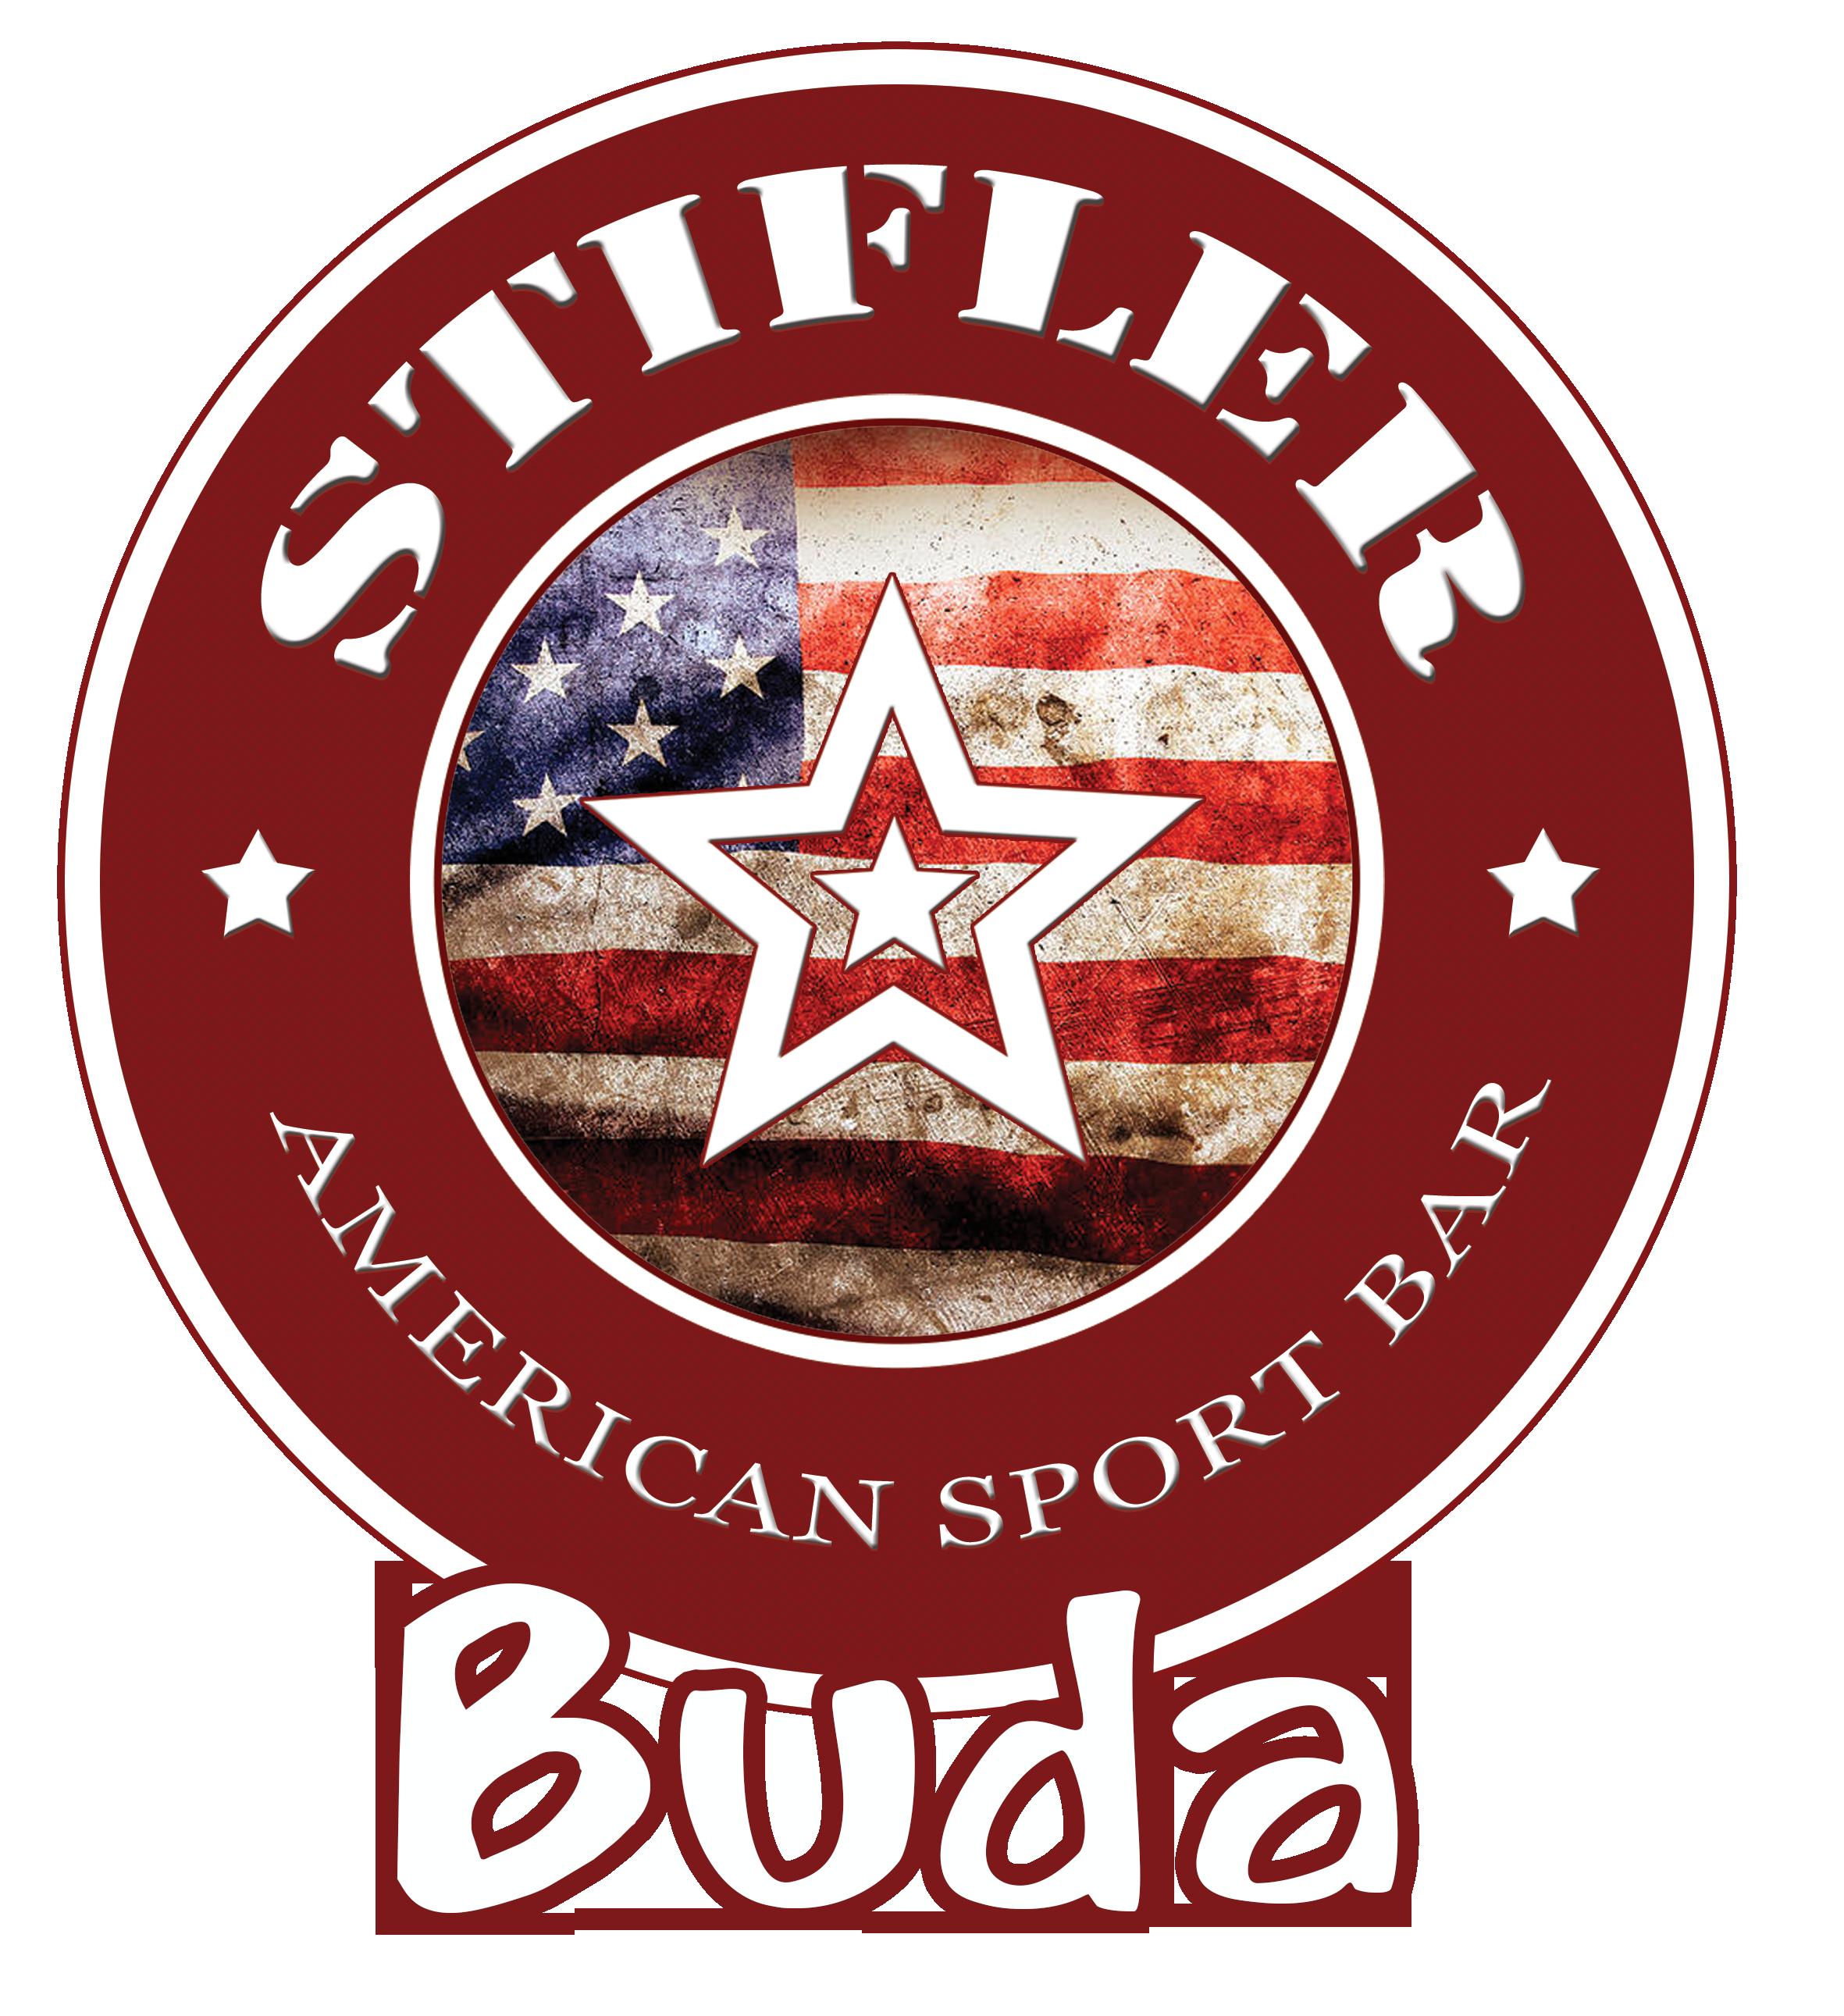 Stifler Buda